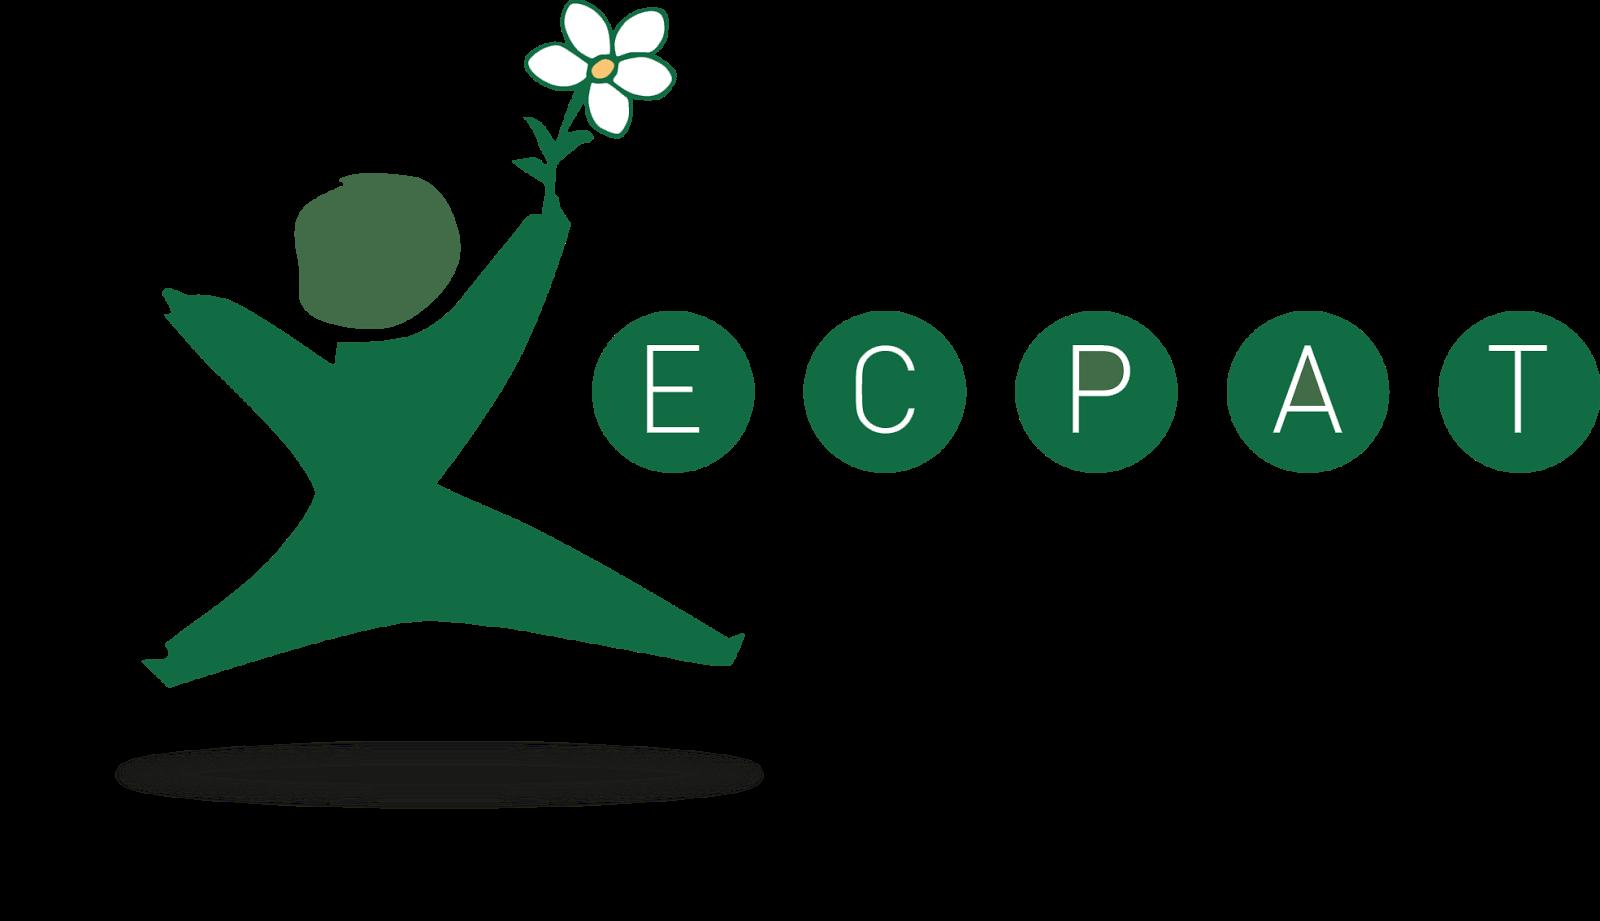 Leadership clipart executive director. Ecpat international job vacancy